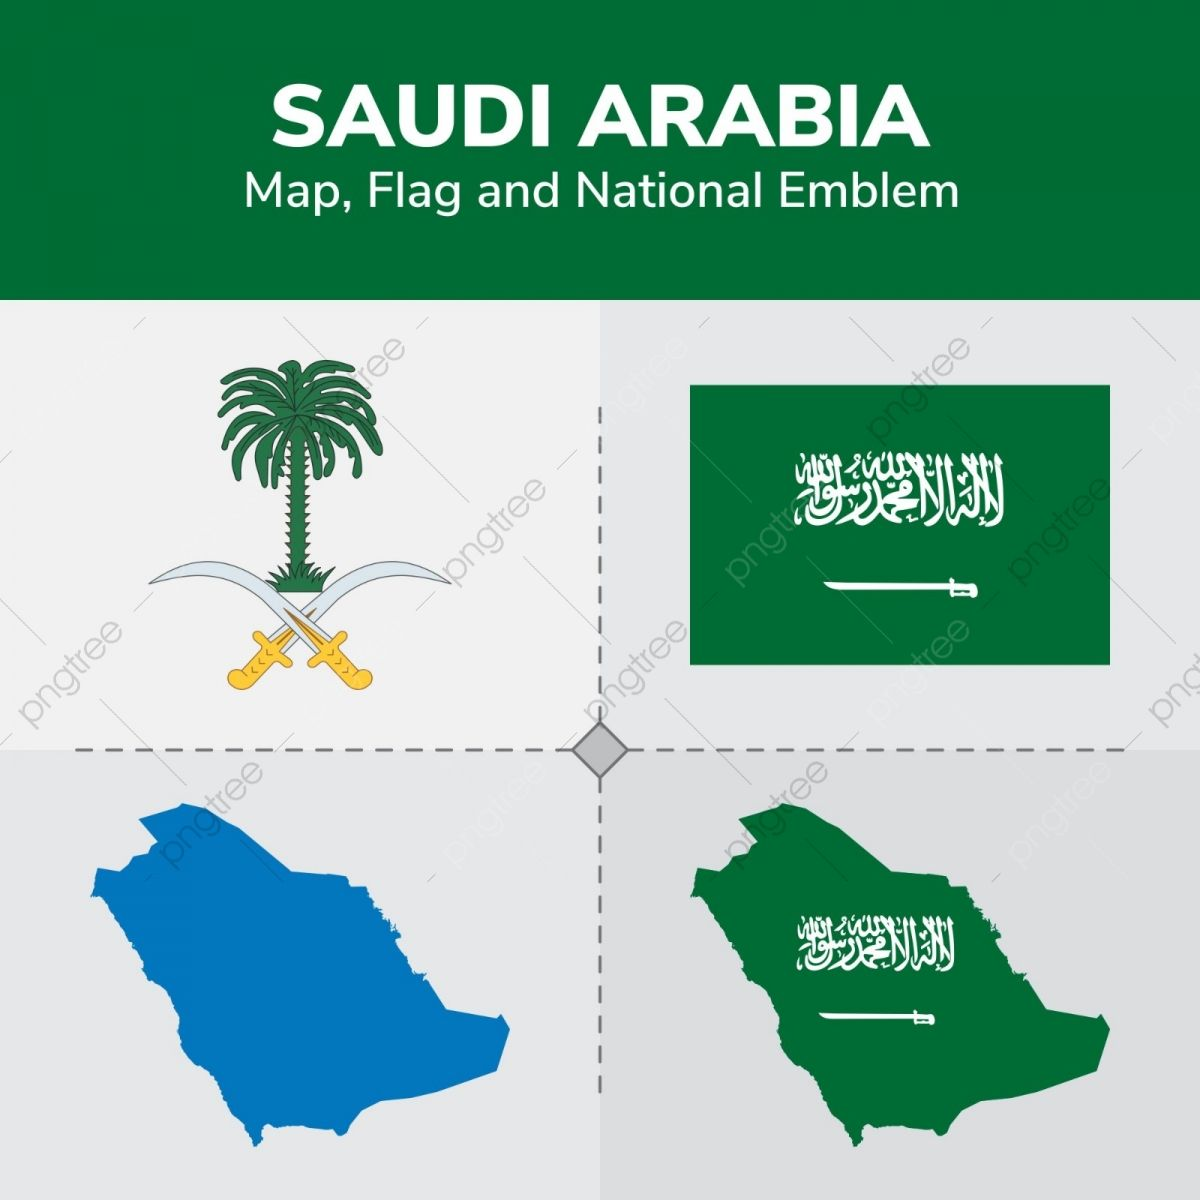 Arabia Saudyjska Mapy Flaga I Godlo Arabia Saudyjska Swieto Narodowe Arabia Saudyjska Swieto Narodowe Arabia Saudyjska Swieto Narodowe Kontynenty Kraje Png I Map Gaming Wallpapers Flag